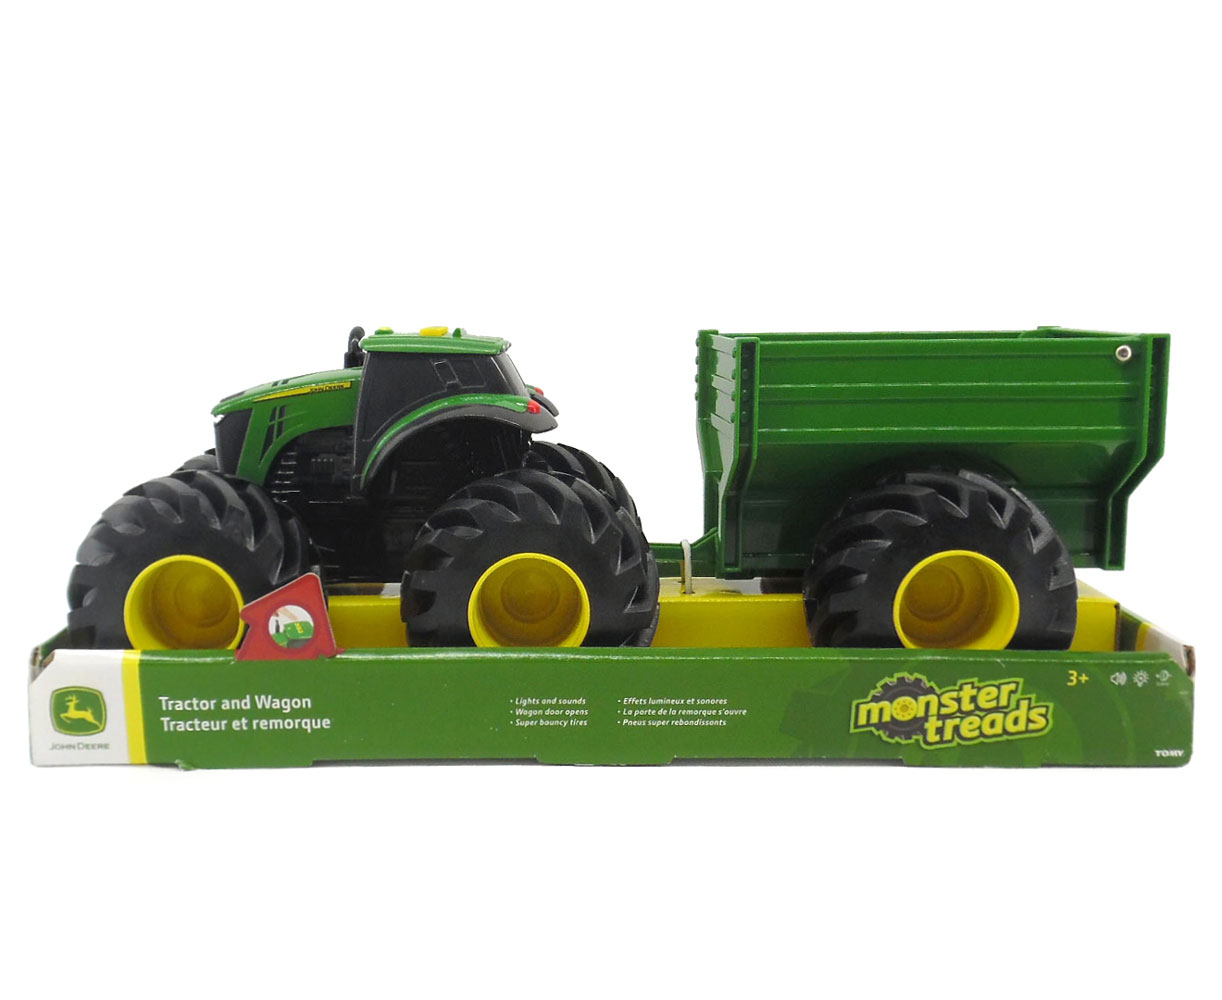 Buy John Deere - Tracteur À Gros Pneus Monster Treads John Deere For Cad  29.99 | Toys R Us Canada tout Dessin Animé De Tracteur John Deere